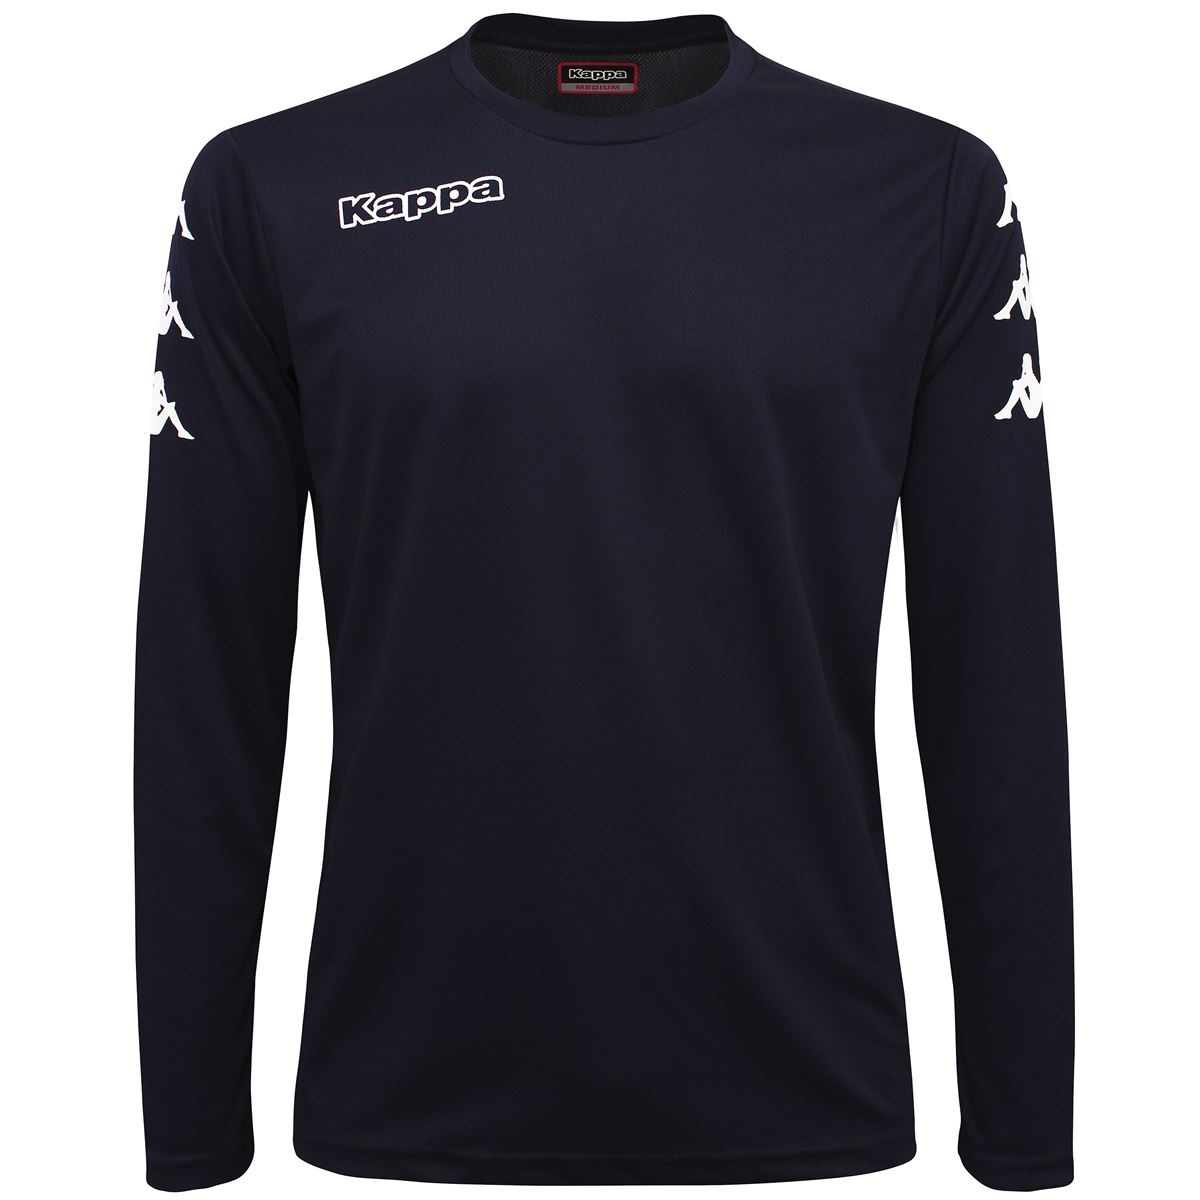 Kappa T-shirt sport Active Jersey KAPPA4SOCCER BOLOS Junior Boy Soccer sport